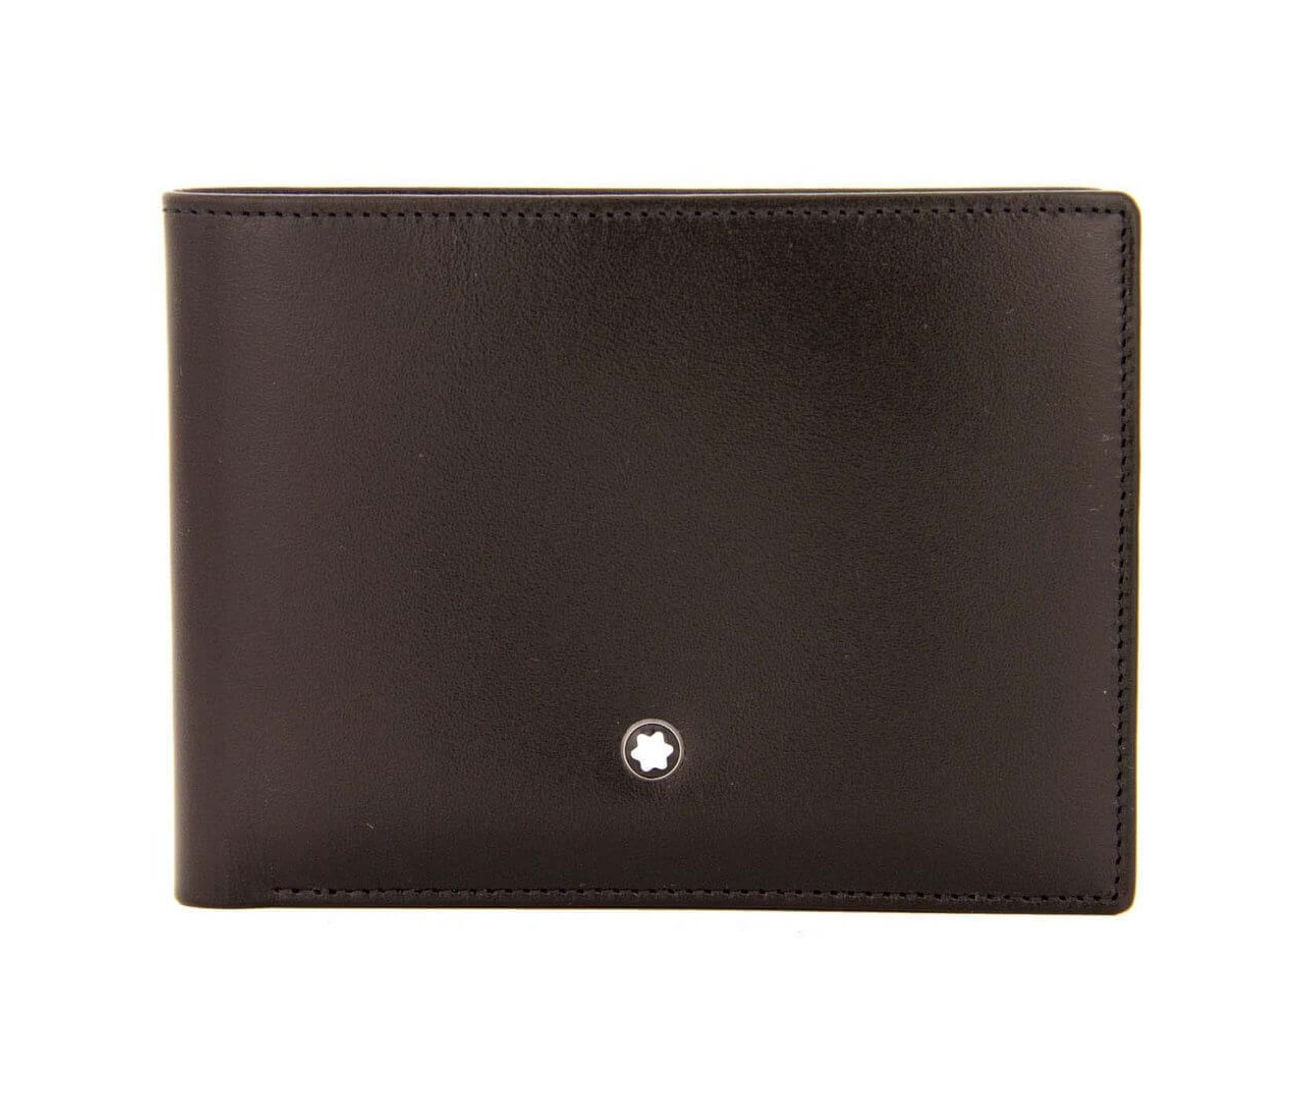 Meisterstuck6 CC wallet